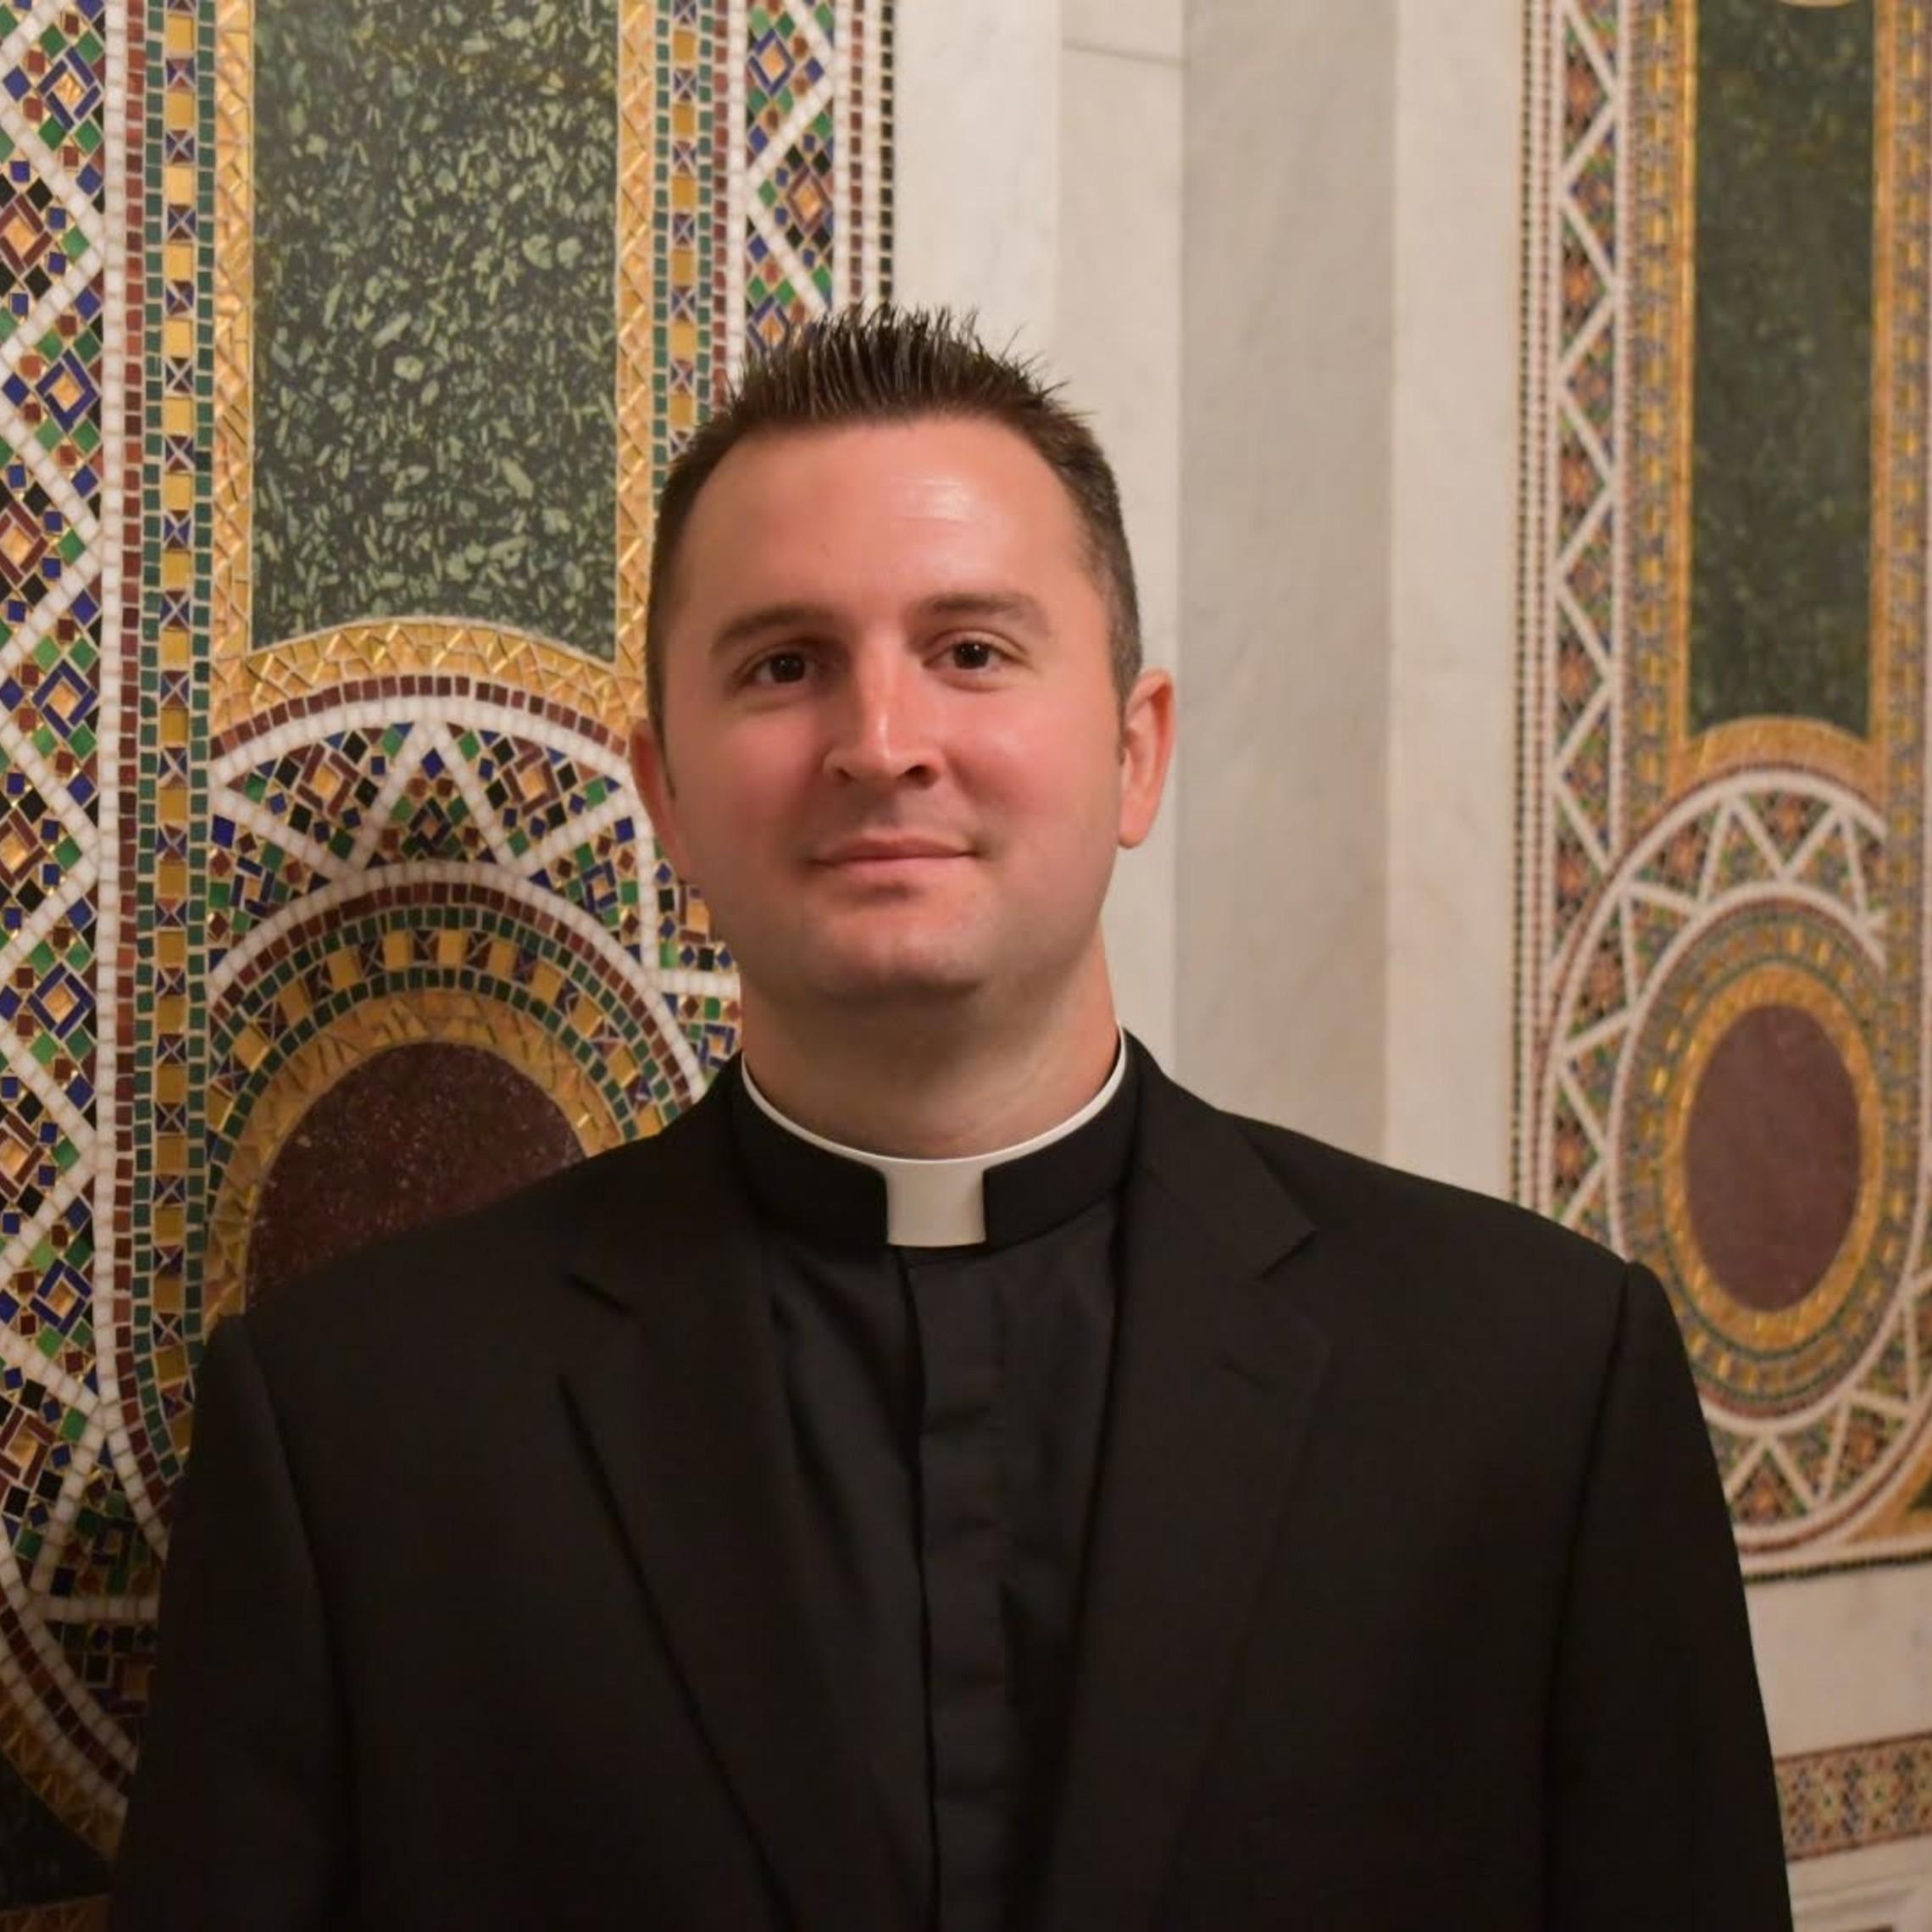 Fr. Zac Povis Parochial Vicar